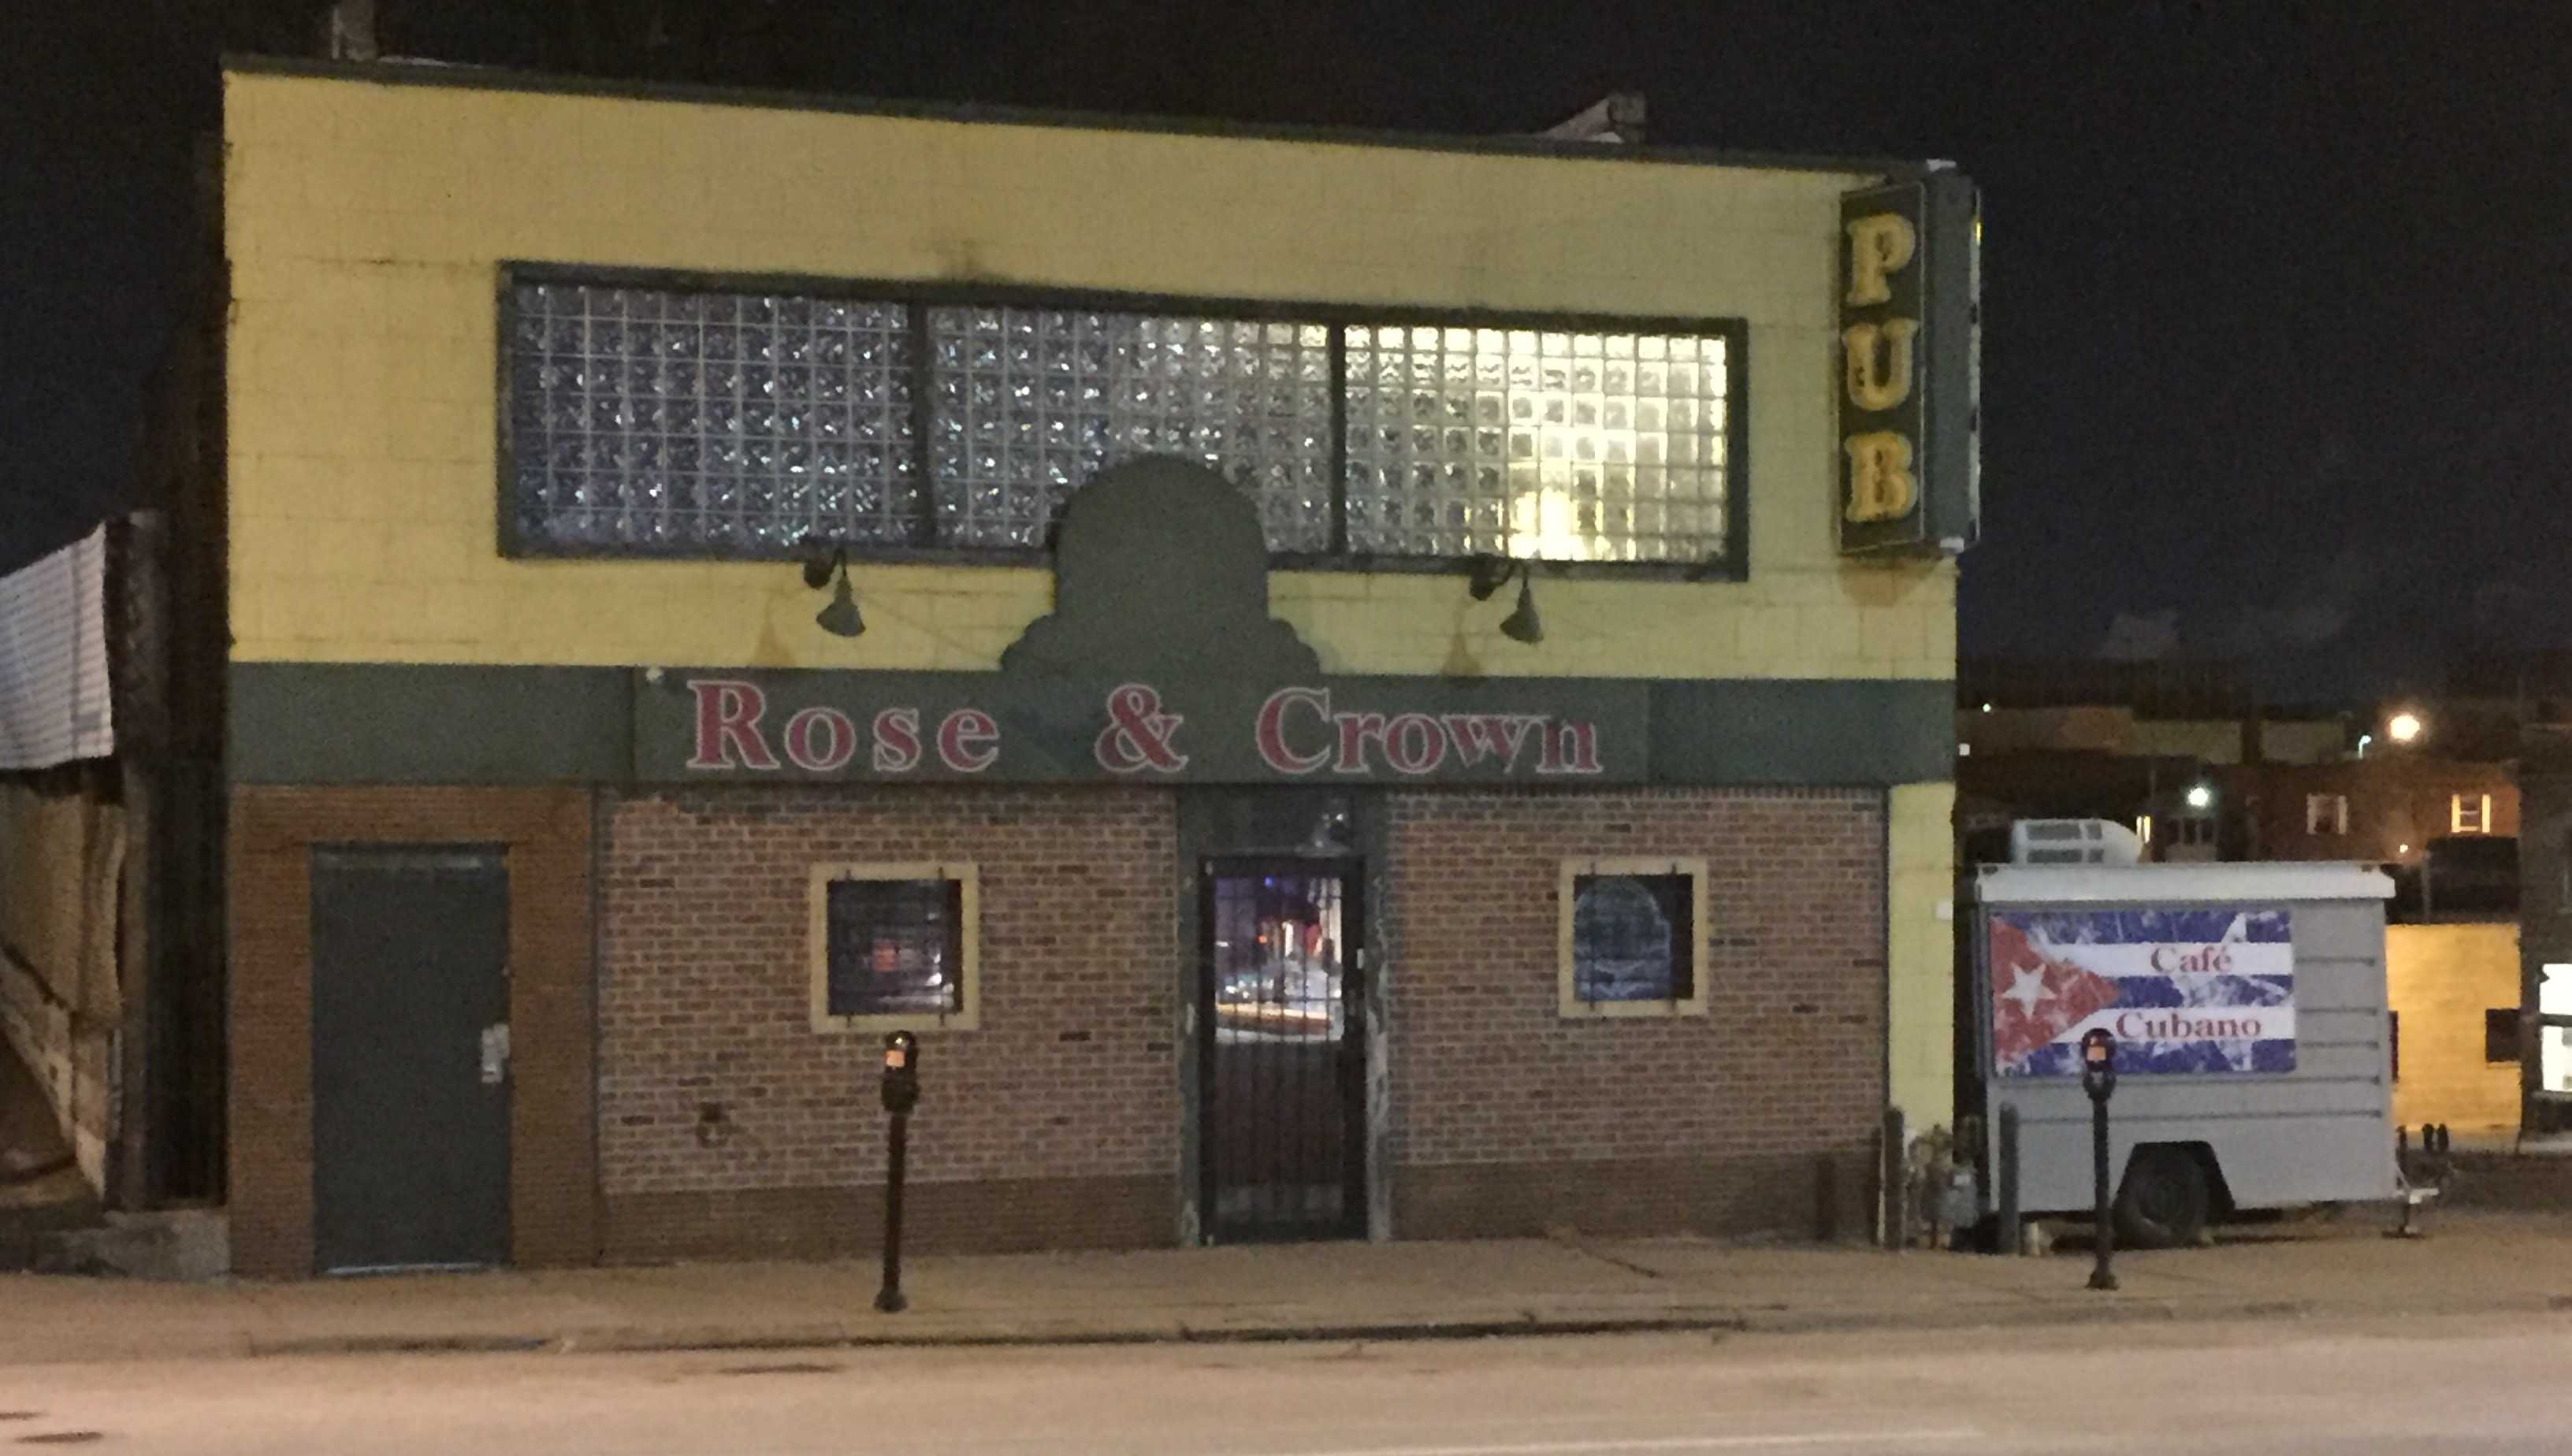 Police identify man shot inside downtown Omaha bar